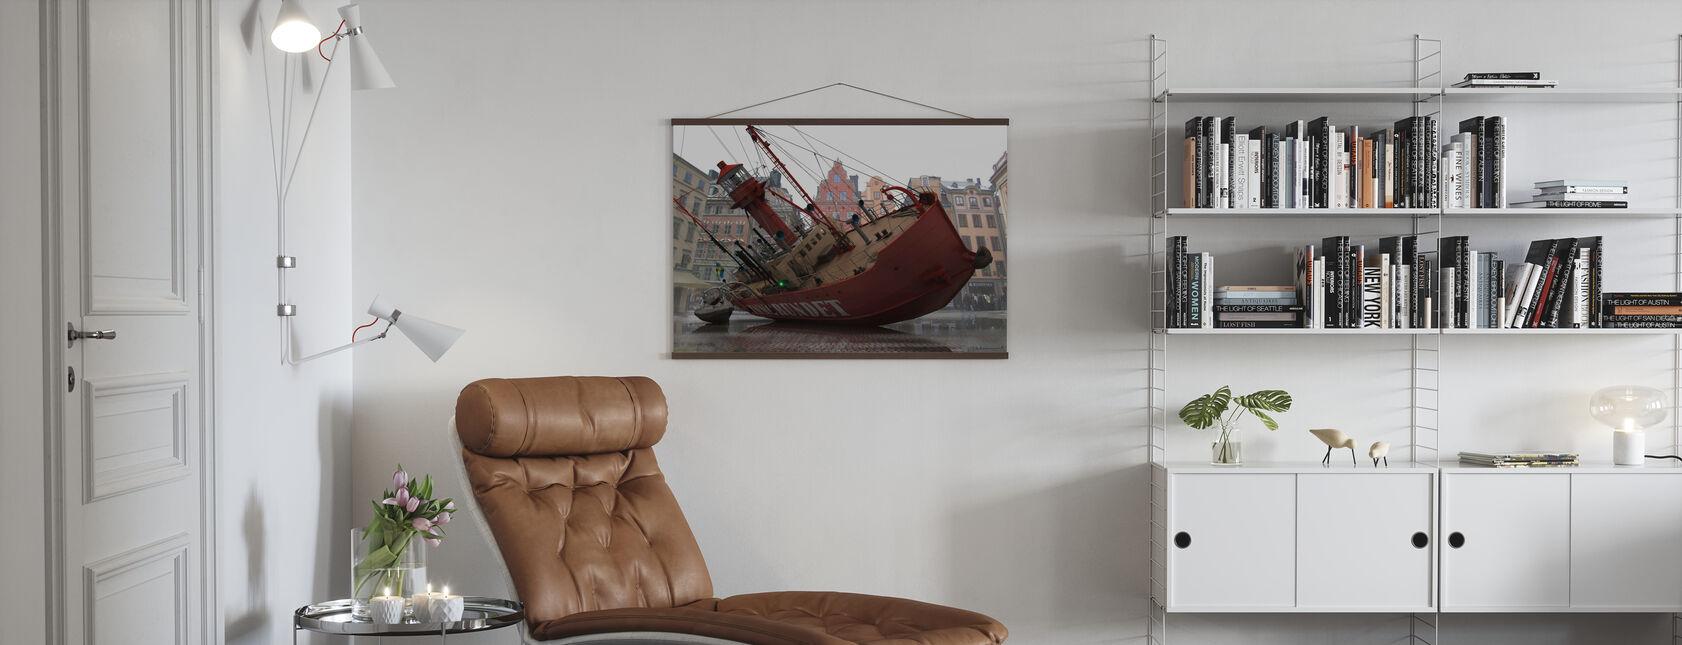 Båt i Gamla stan - Poster - Vardagsrum